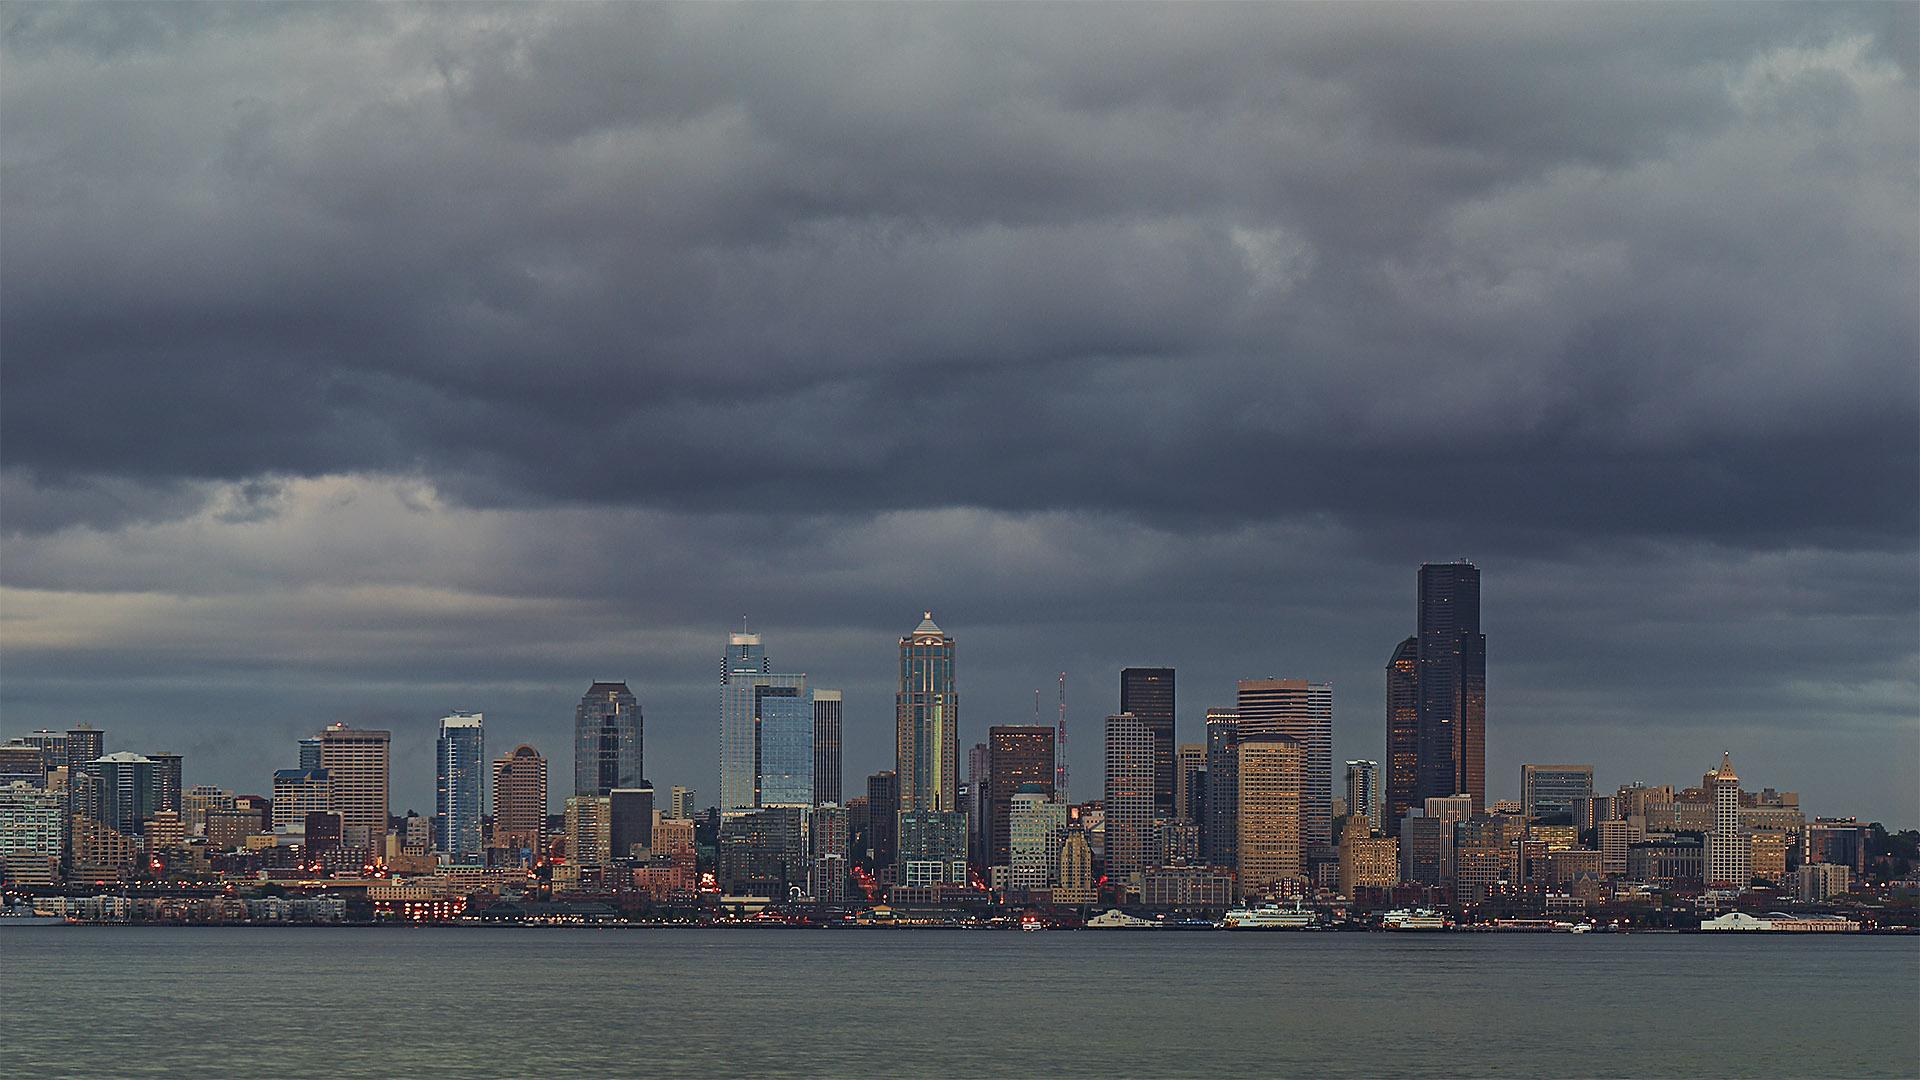 35 Hd Seattle Skyline Wallpapers On Wallpapersafari